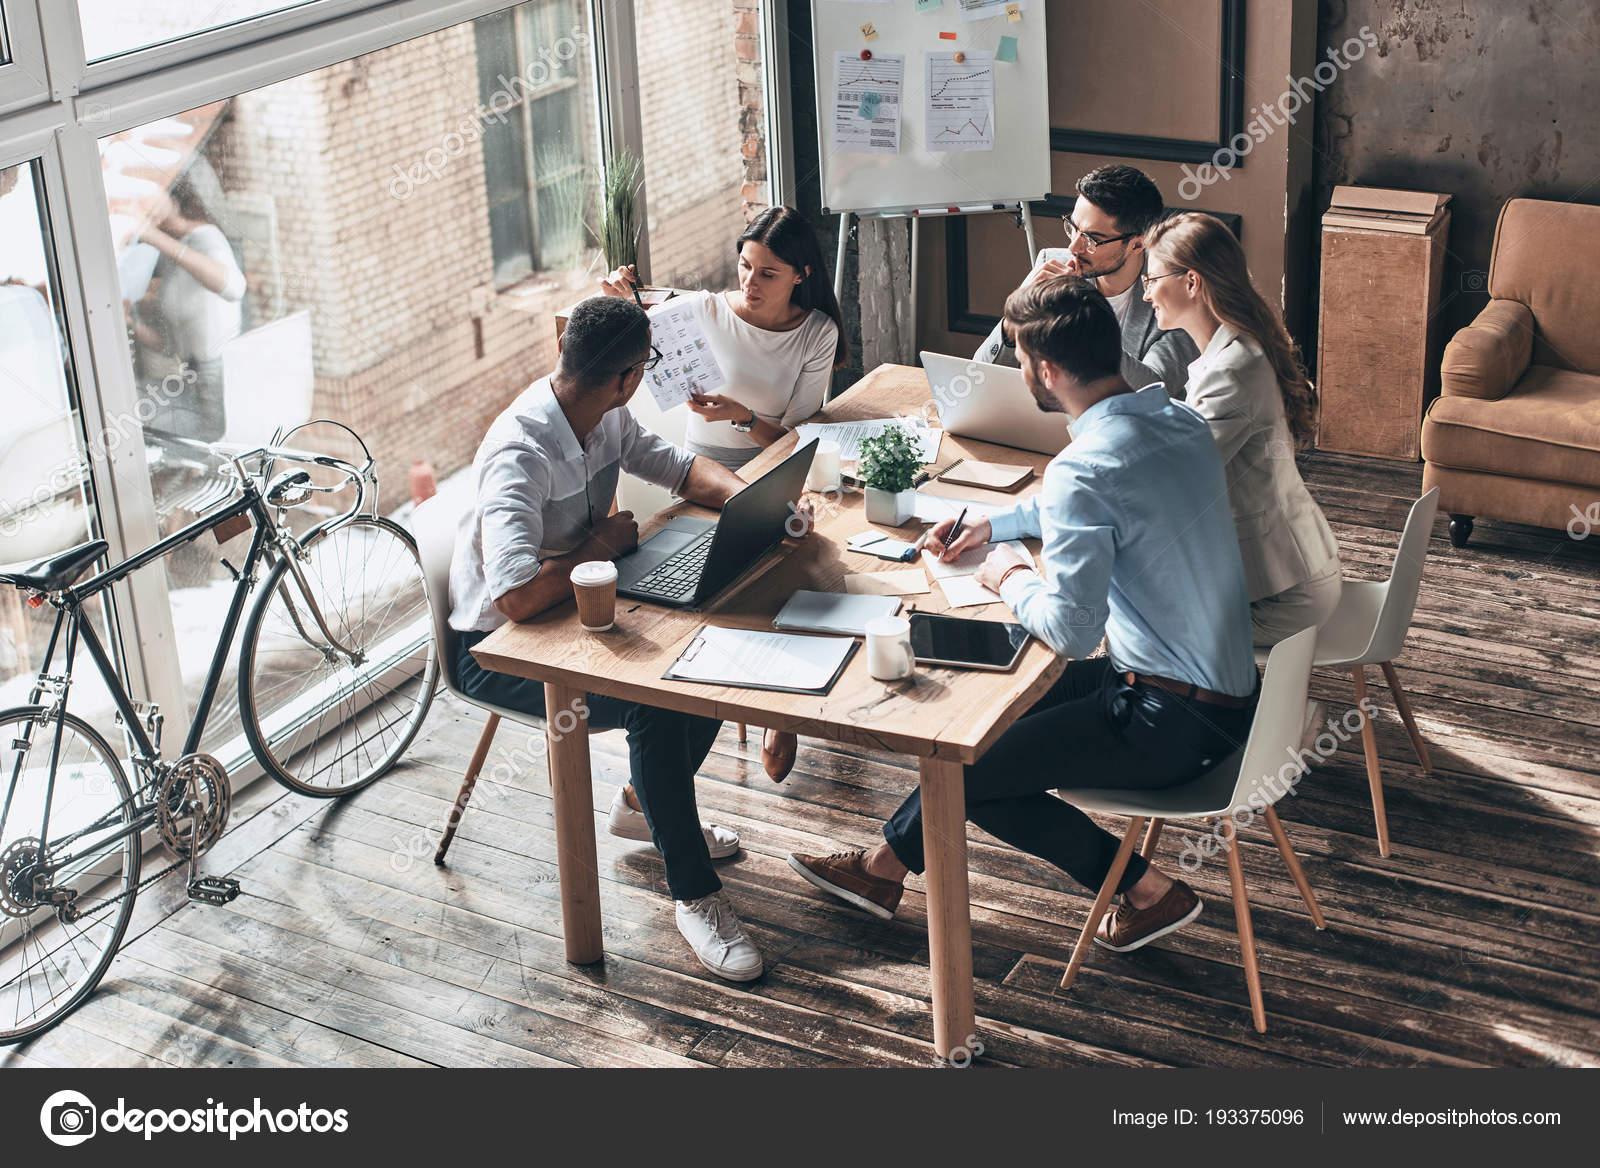 kitchen window ideas pictures for wall 商务同事在创意办公室用自行车在橱窗里集思广益 图库照片 c gstockstudio